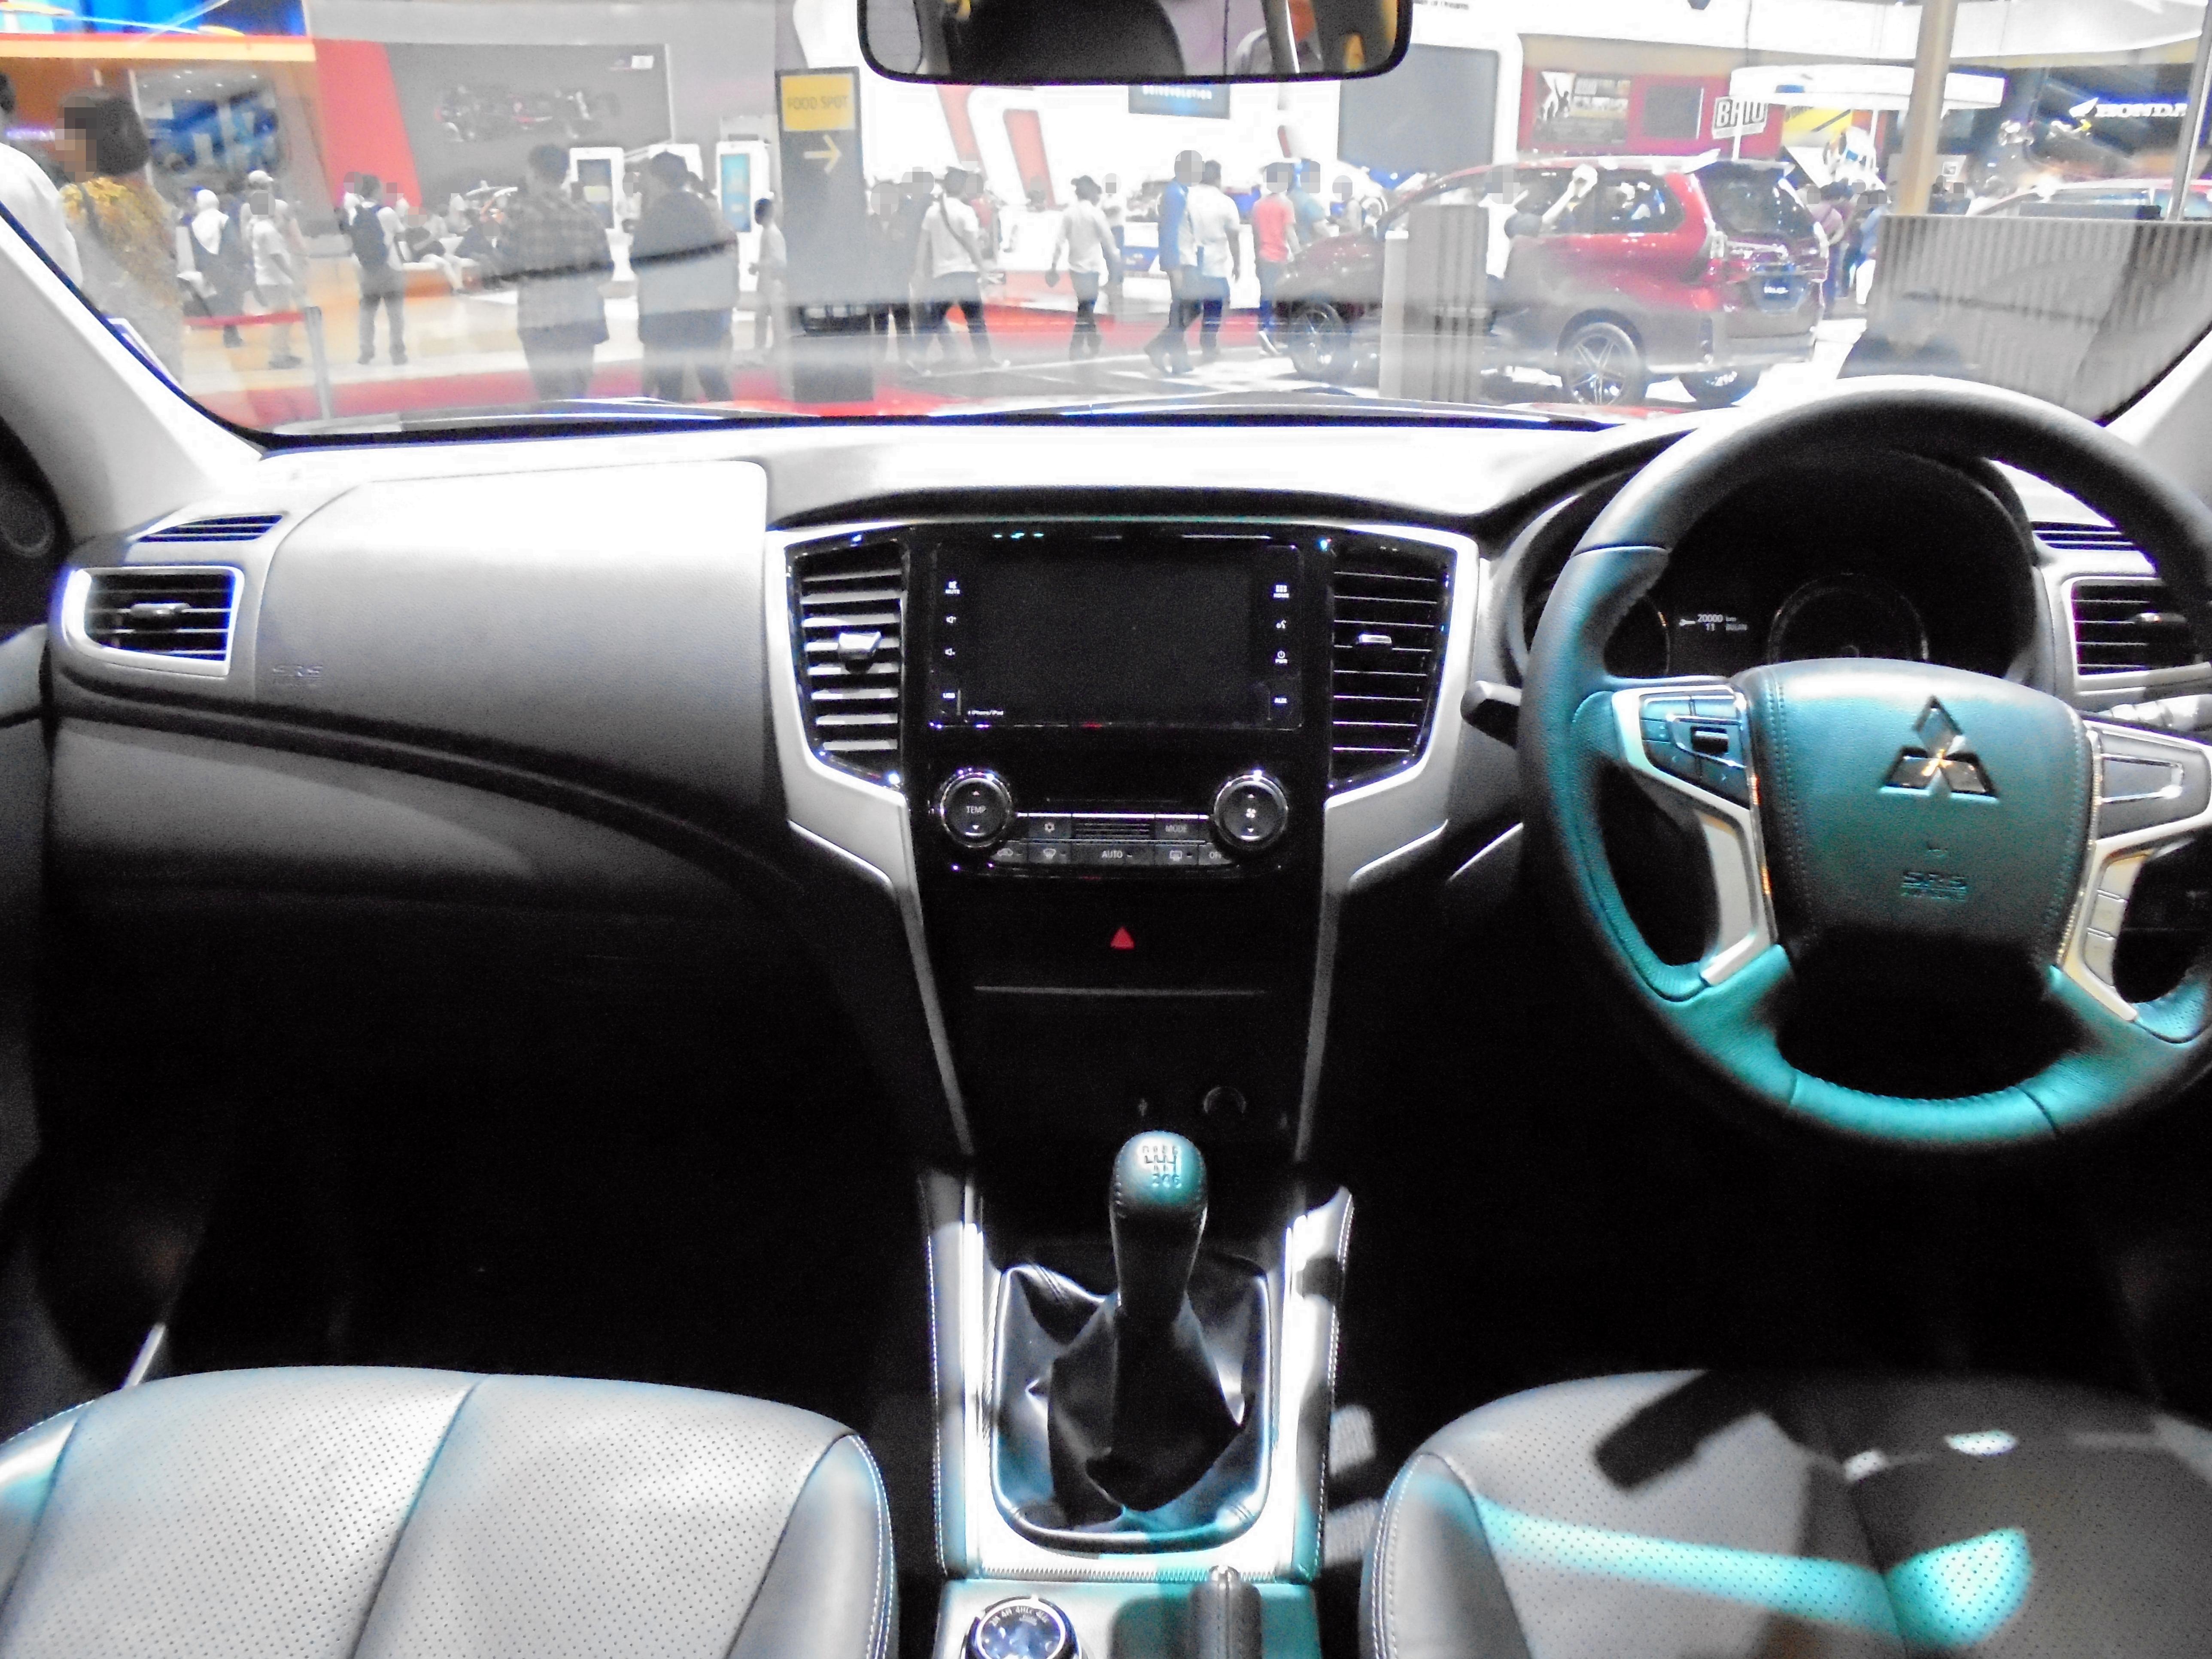 File 2019 Mitsubishi Triton Exceed 4x4 2 4 Kl1tj Interior 20190722 Jpg Wikimedia Commons